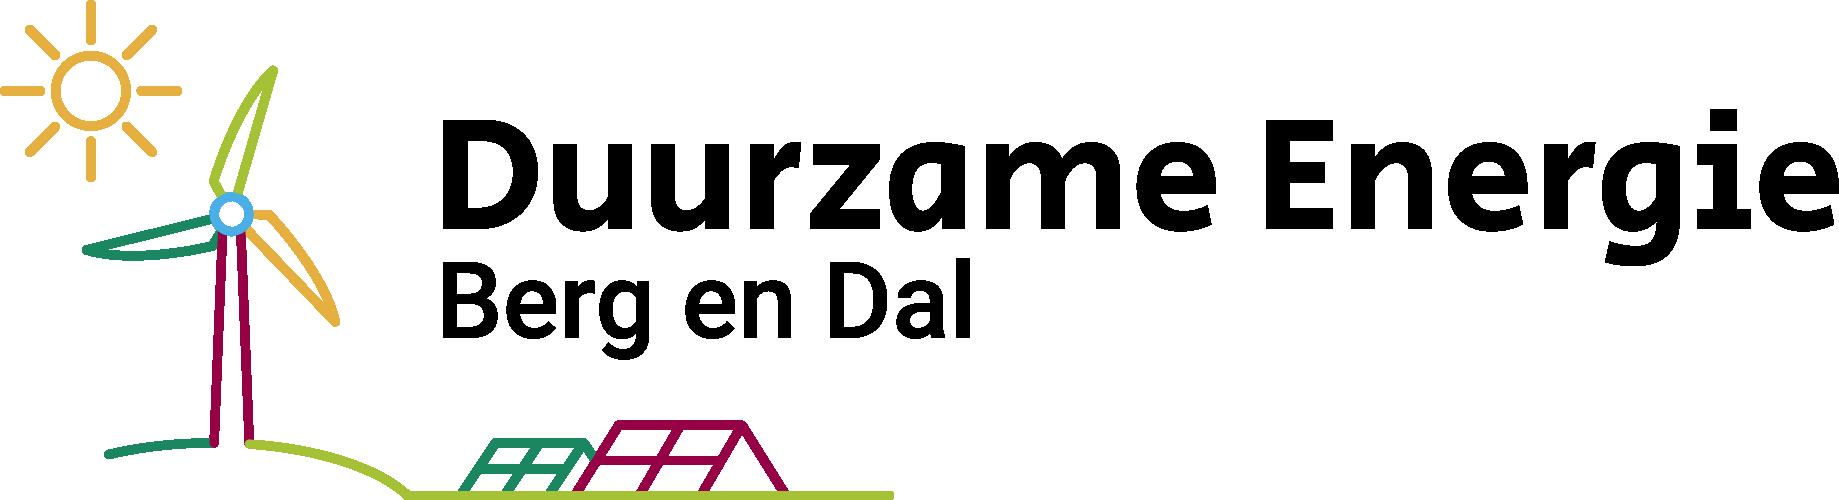 Logo Duurzame Energie Berg en Dal